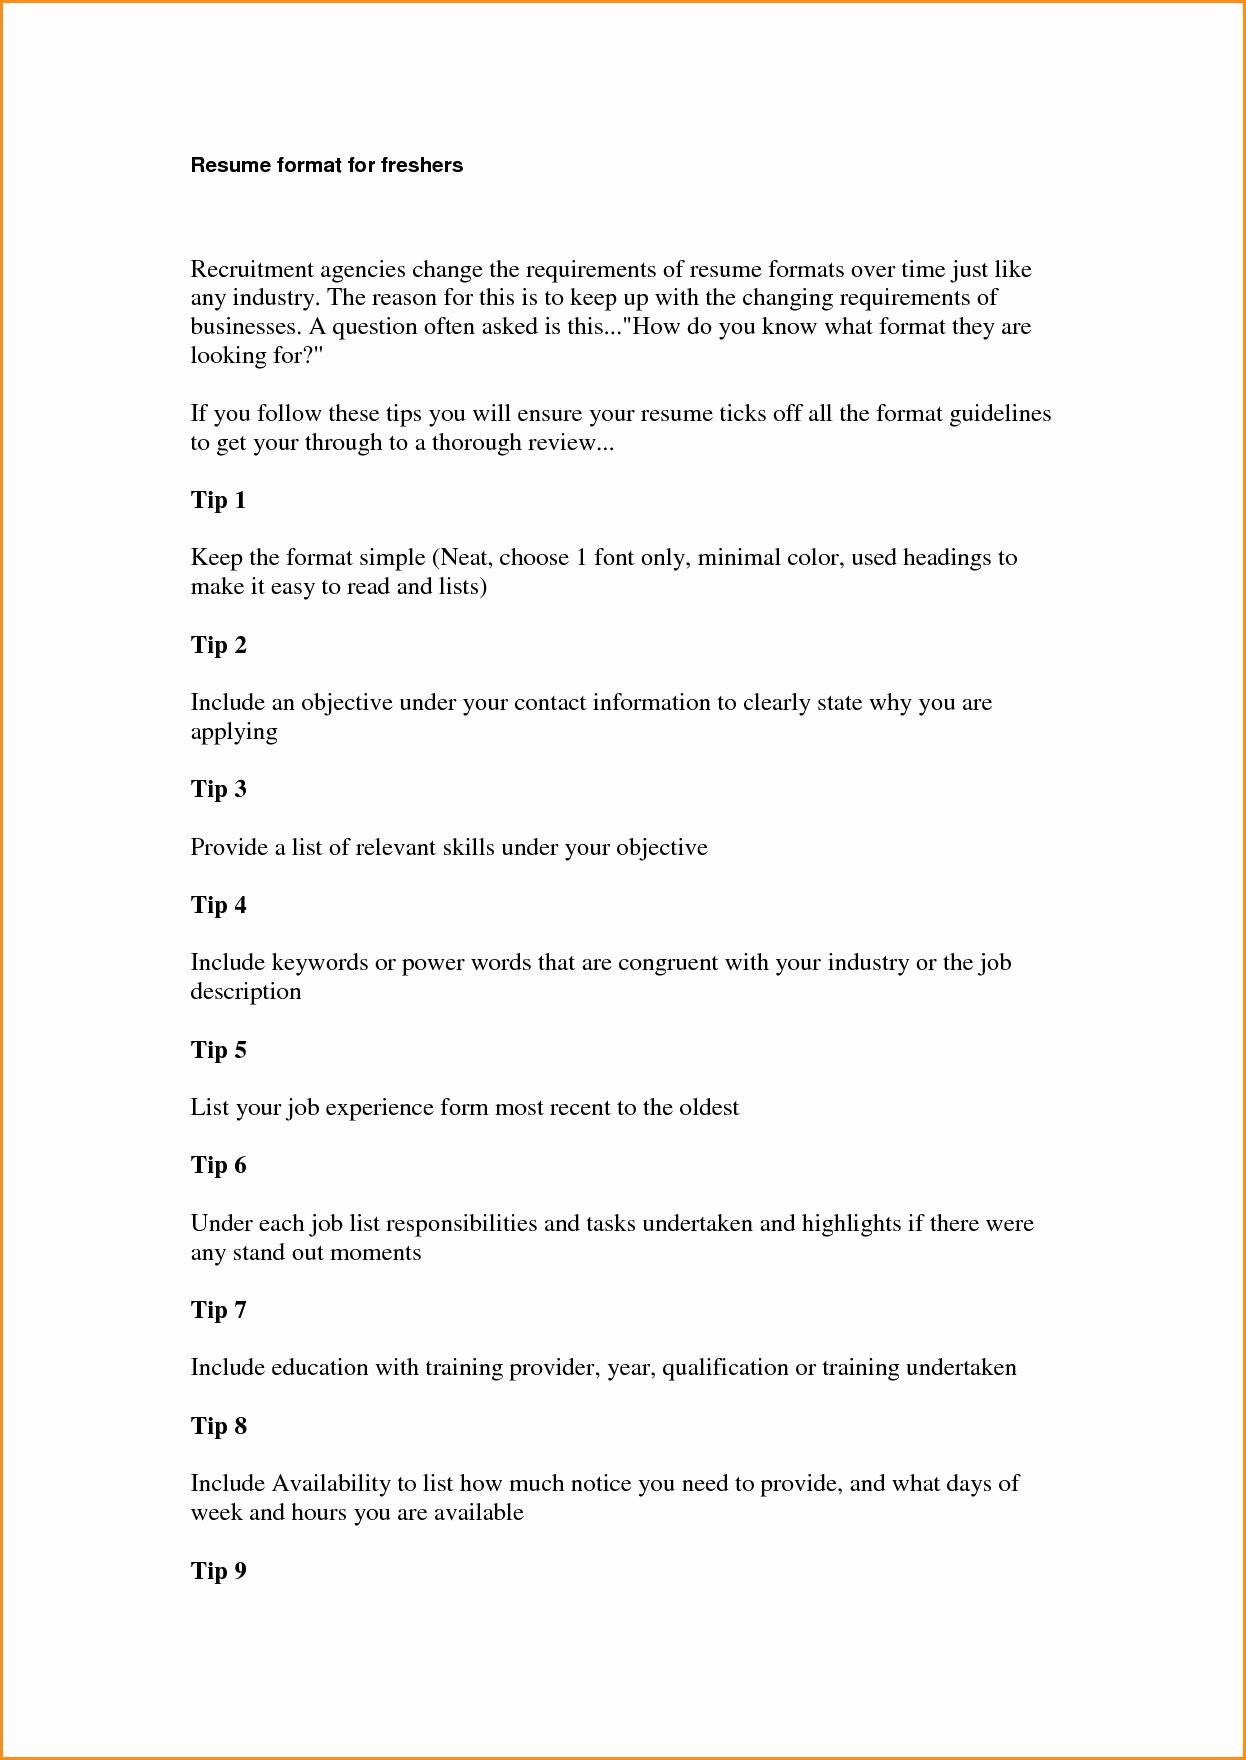 Sample Resume In Word format Inspirational 11 Freshers Resume Samples In Word format